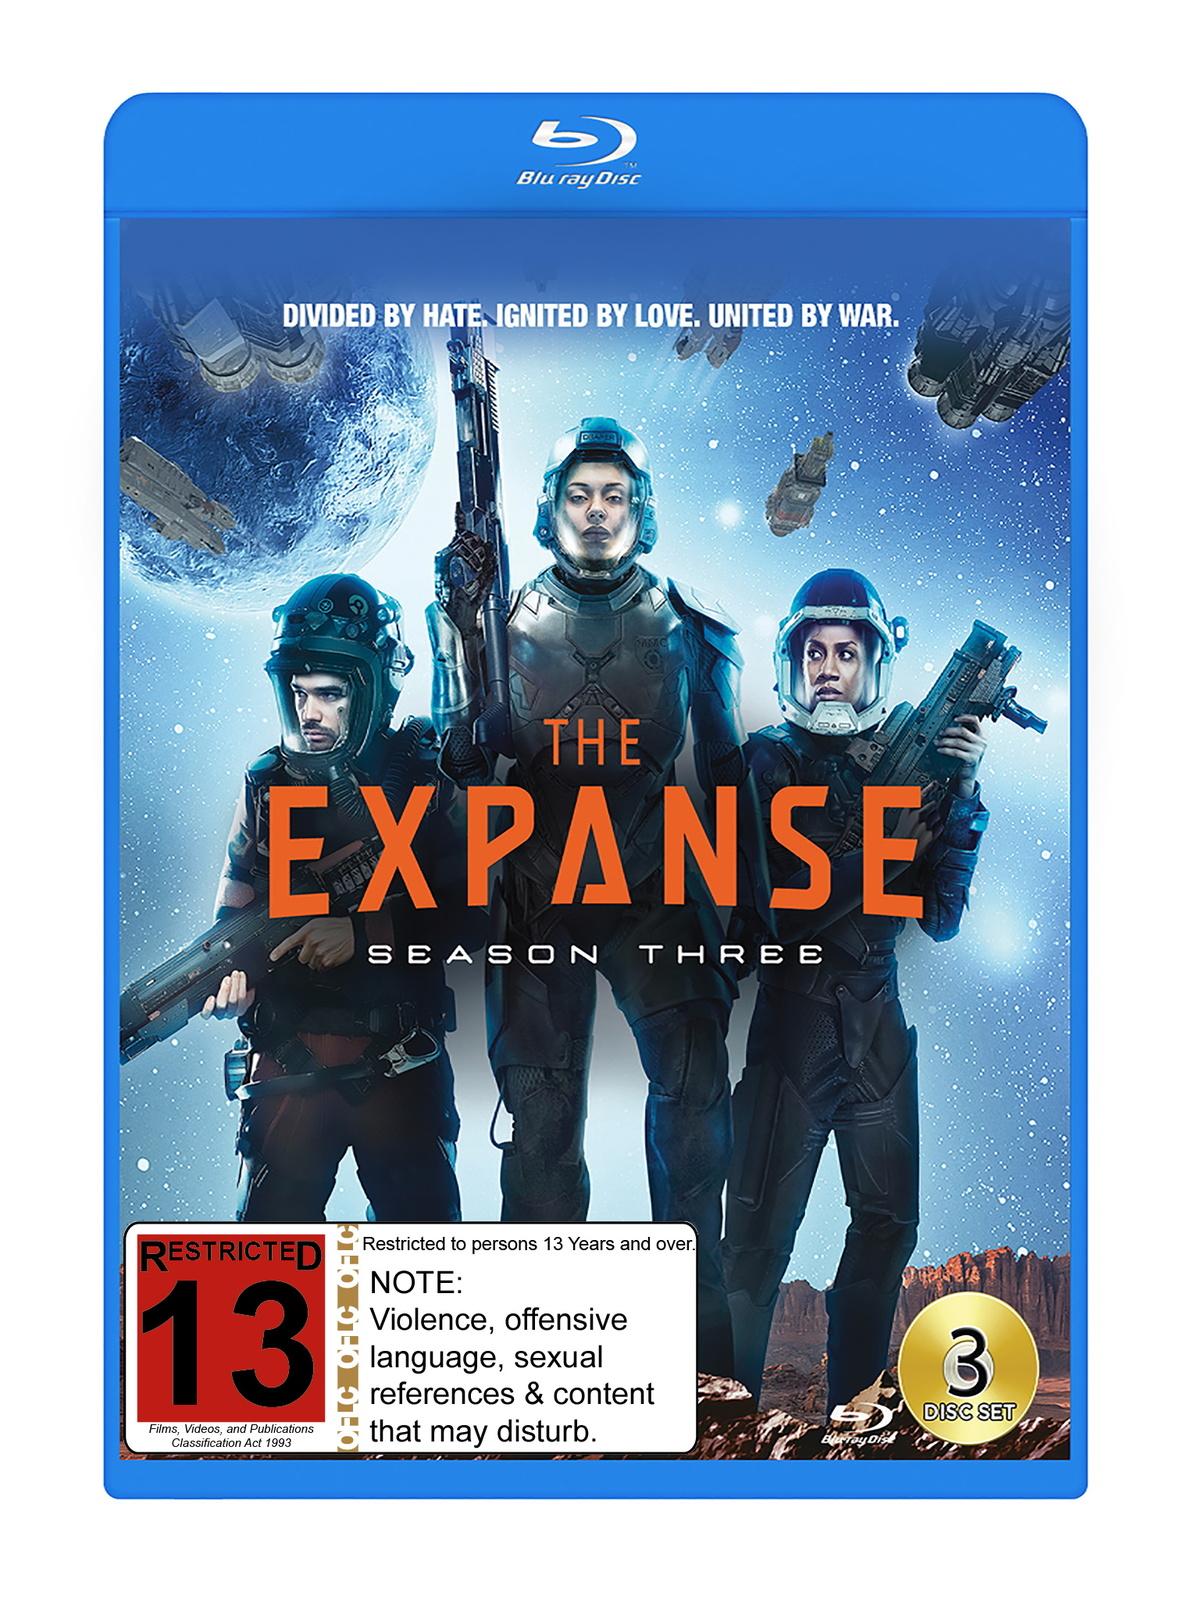 The Expanse - Season 3 on Blu-ray image